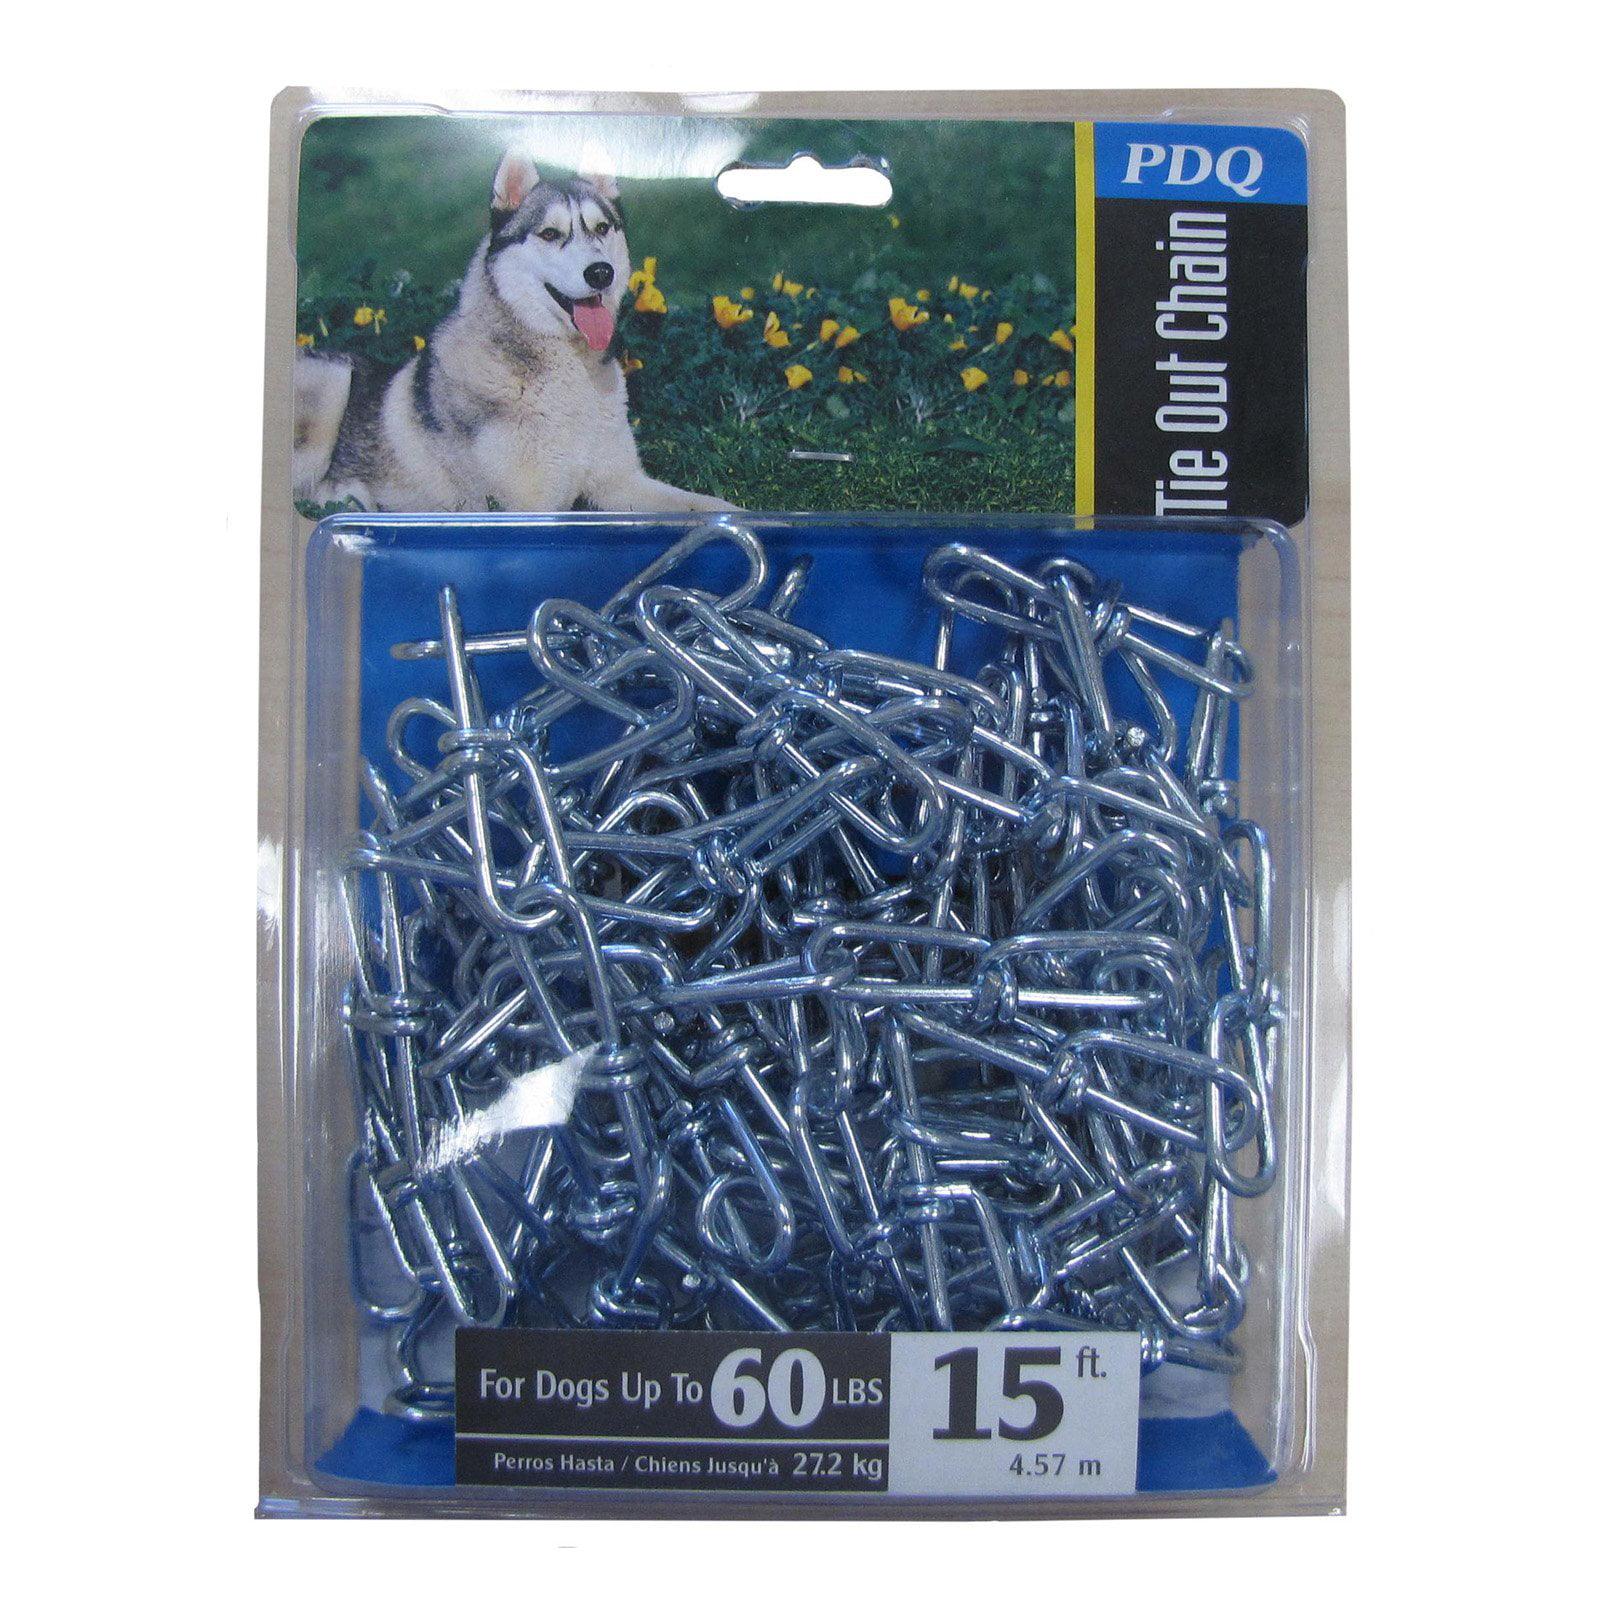 Boss Pet 43720 20 Large Pdq Twisted Dog Chain Walmart Com